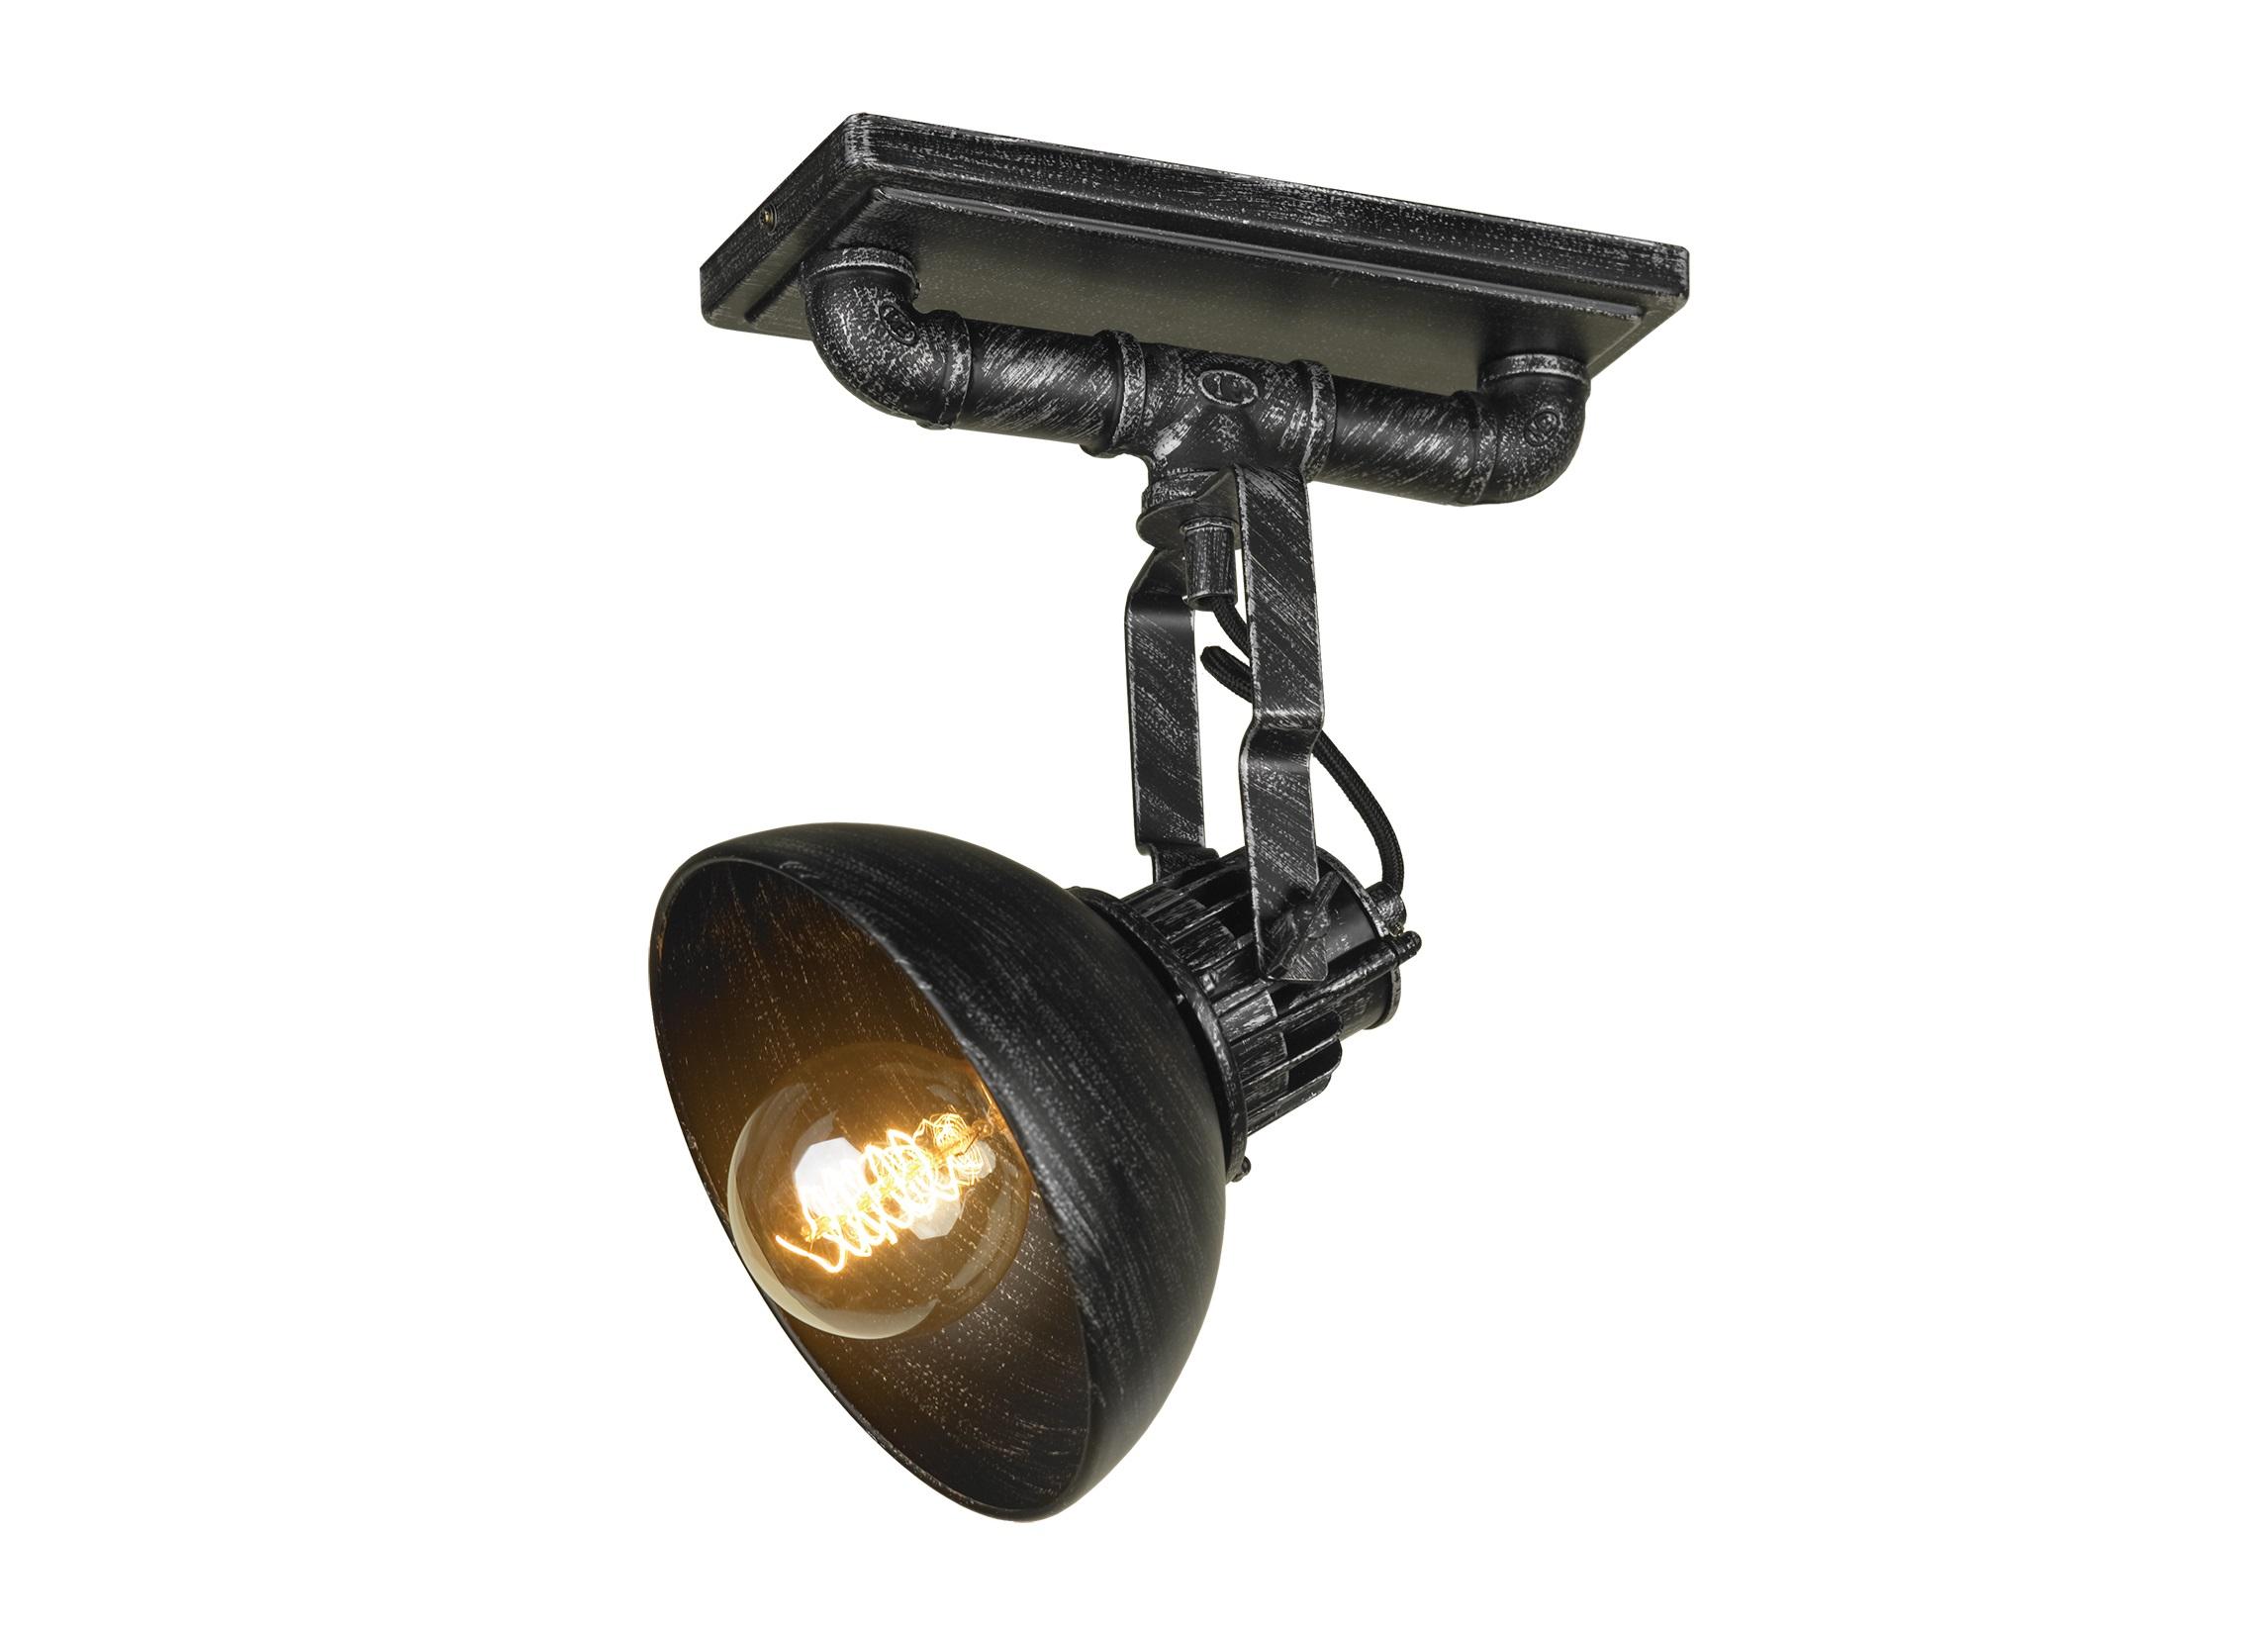 БраБра<br>Вид цоколя: E27Мощность: 60WКоличество ламп: 1Наличие ламп: отсутствуют.<br><br>kit: None<br>gender: None